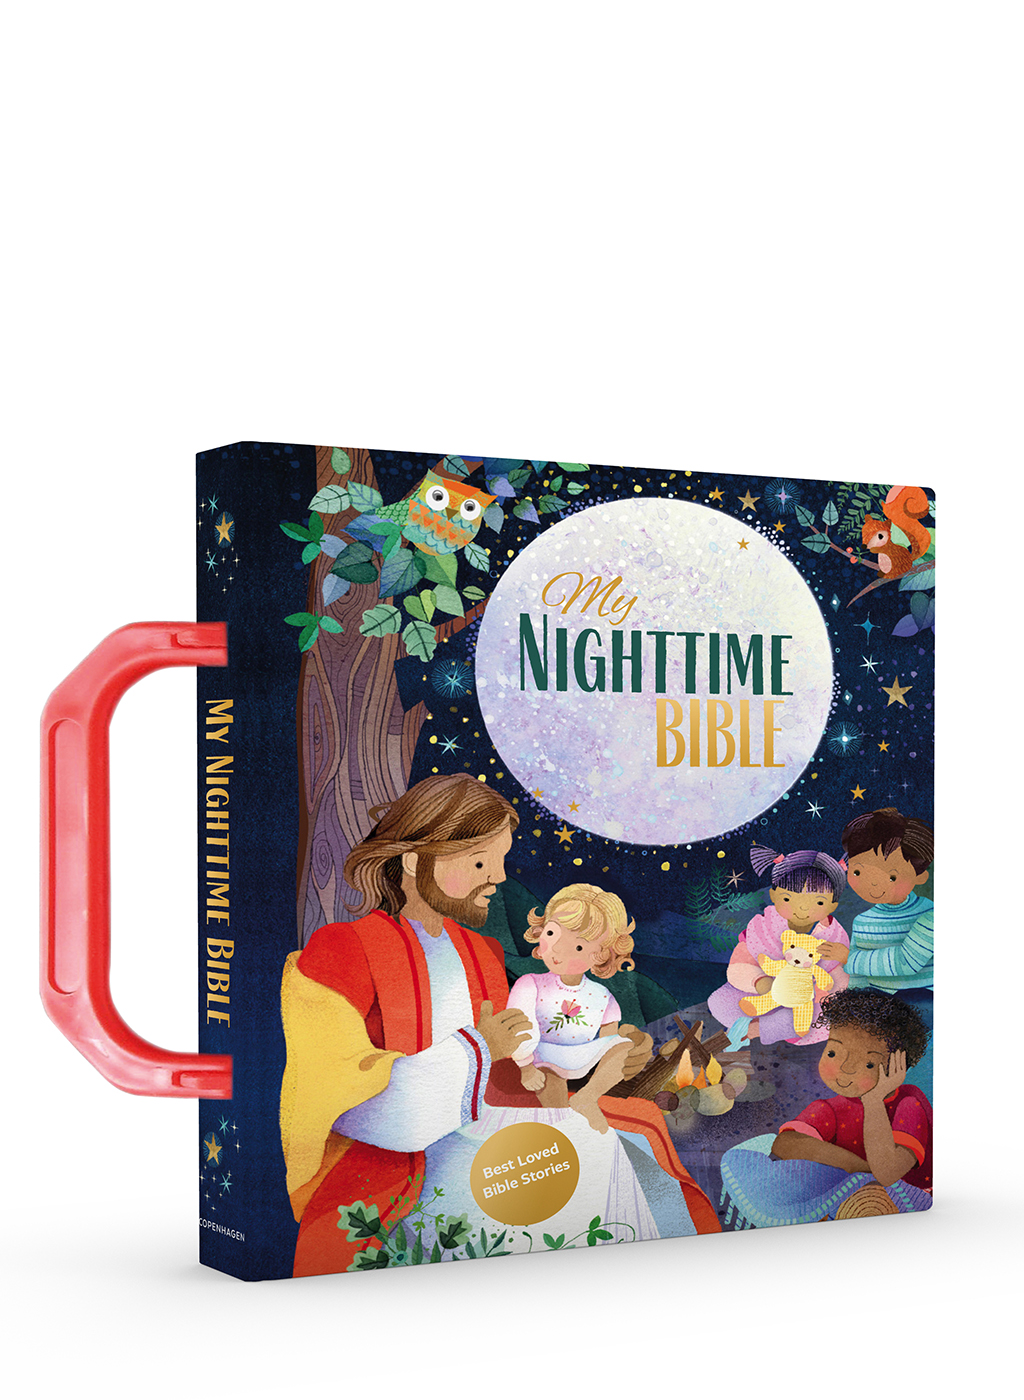 My Nighttime Bible